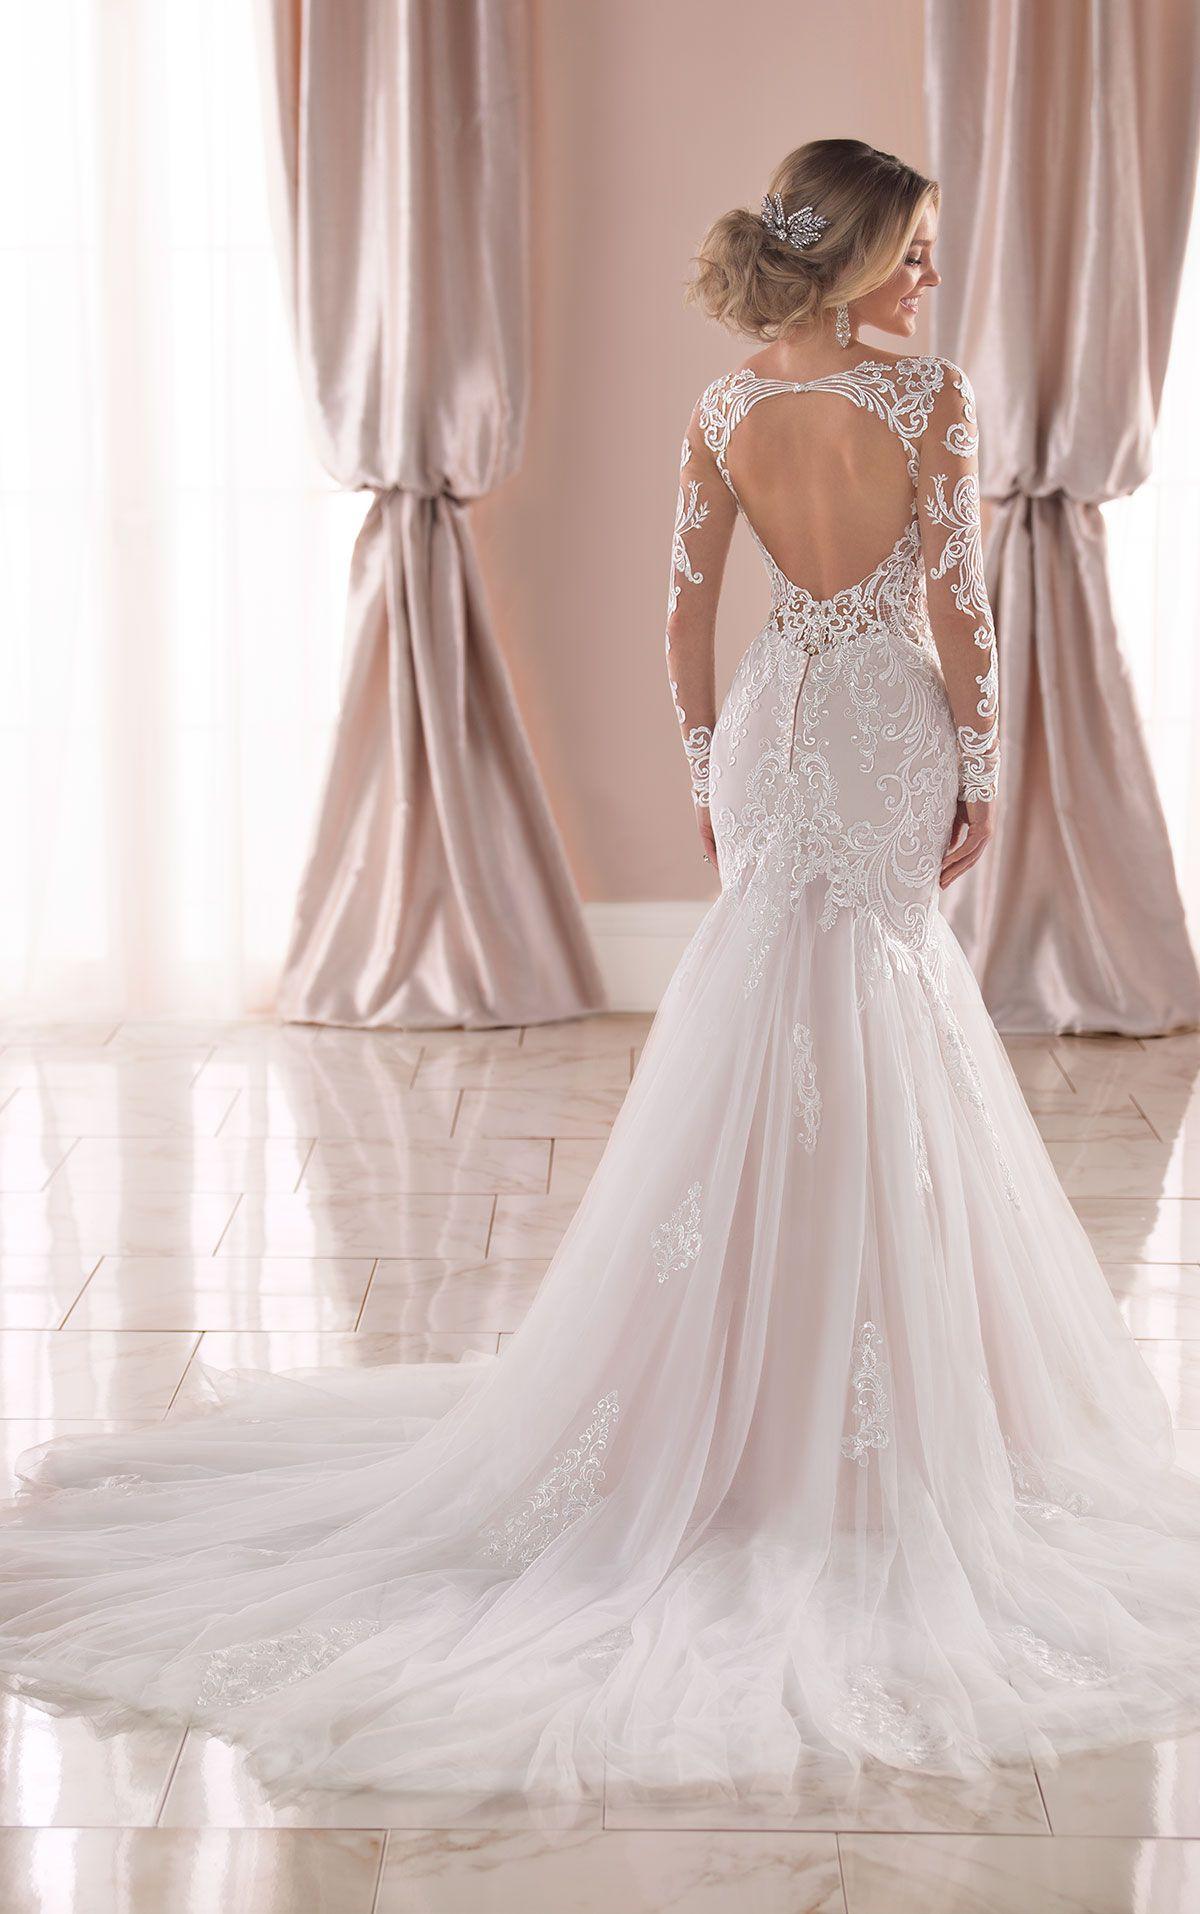 Almaj Bridal Auckland Wedding Dresses Bridal Shop Trumpet Wedding Dress Lace Long Sleeve Mermaid Wedding Dress Wedding Dresses Lace [ 1914 x 1200 Pixel ]